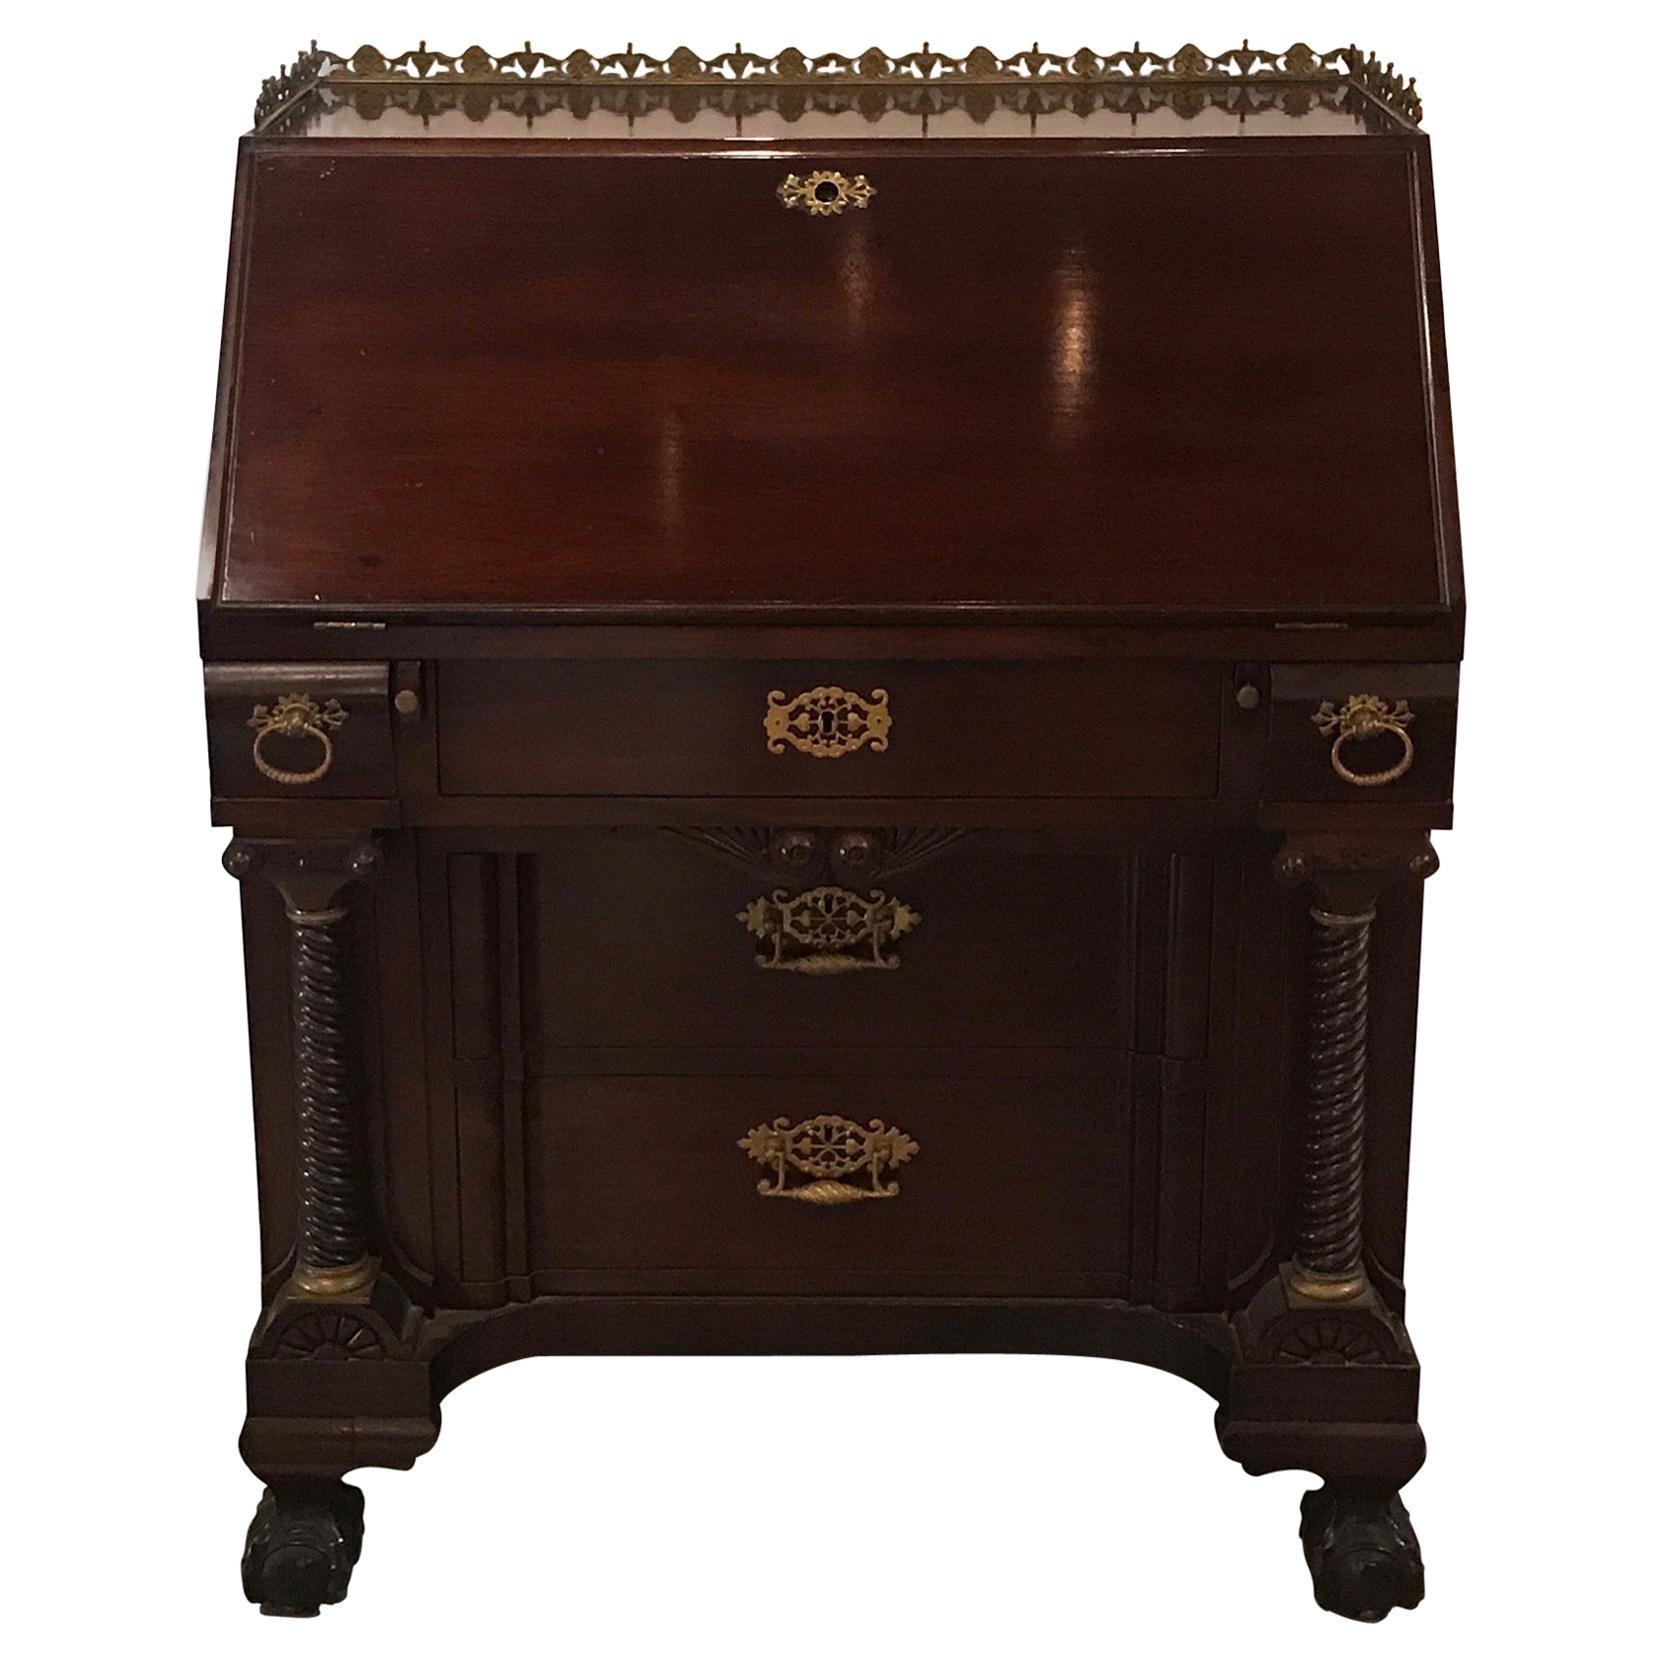 Antique English Chippendale Mahogany Slant Front Desk